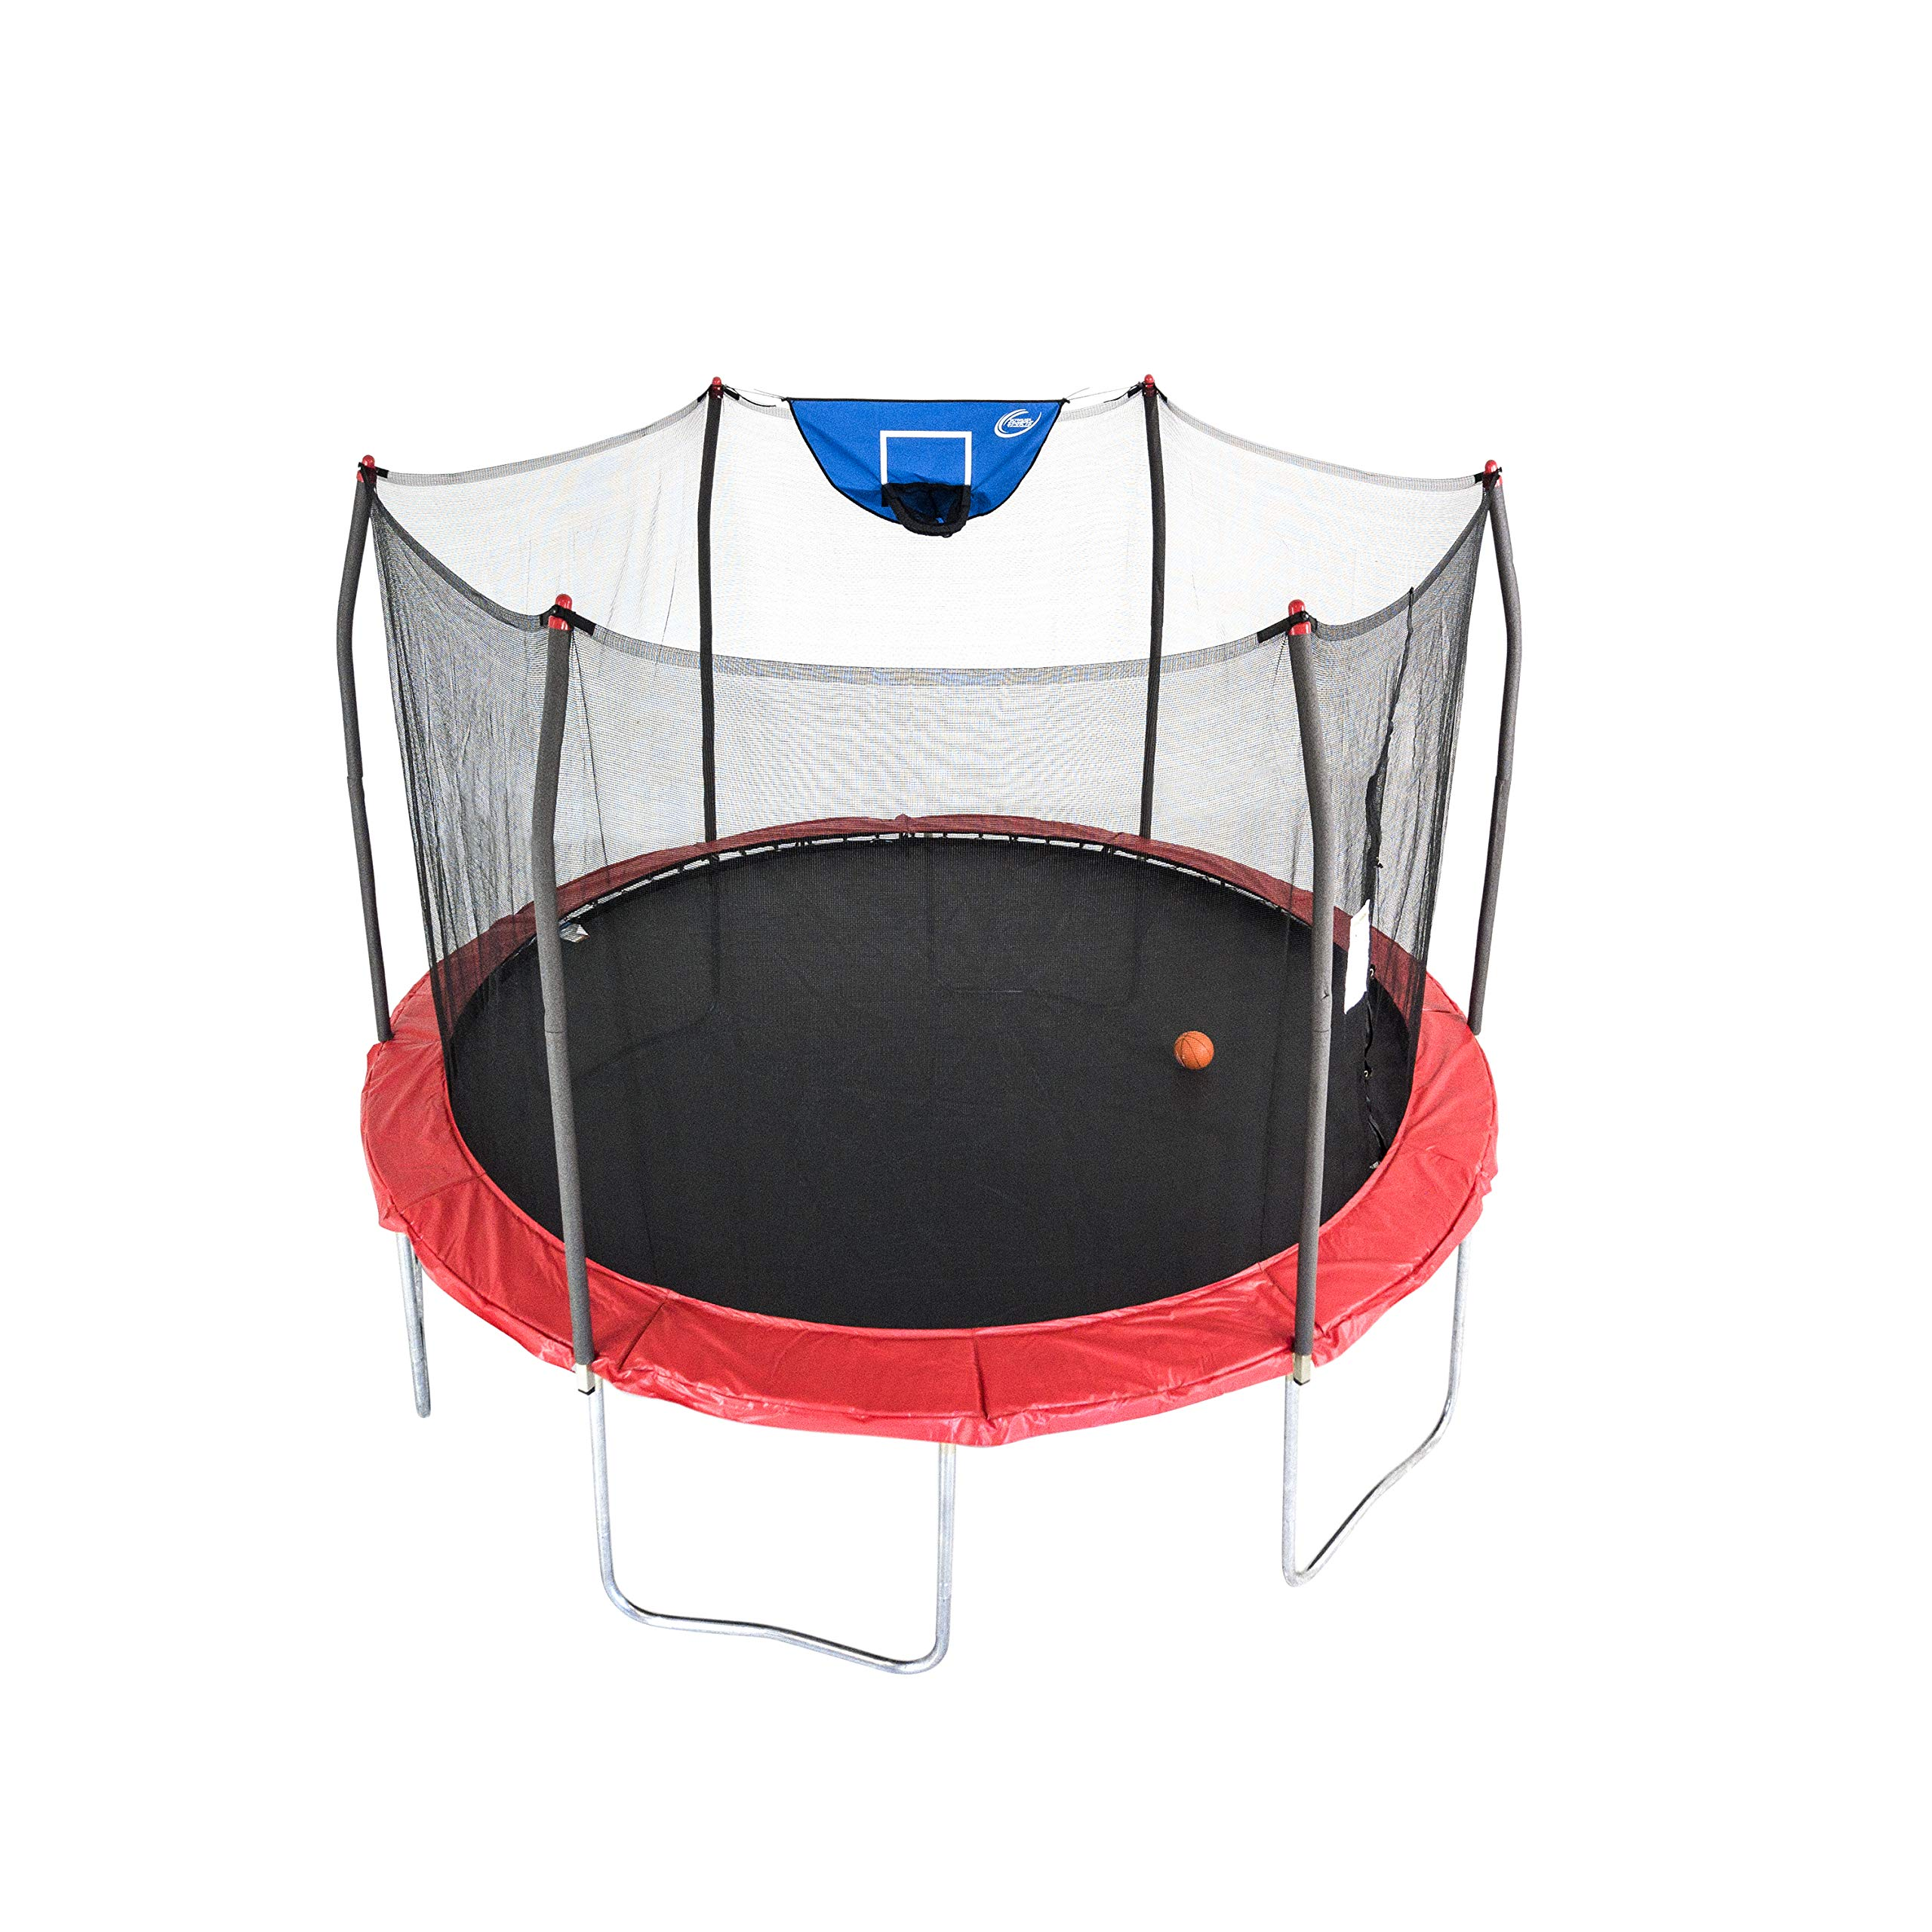 Skywalker Trampolines 12-Foot Jump N' Dunk Trampoline with Enclosure Net - Basketball Trampoline by Skywalker Trampolines